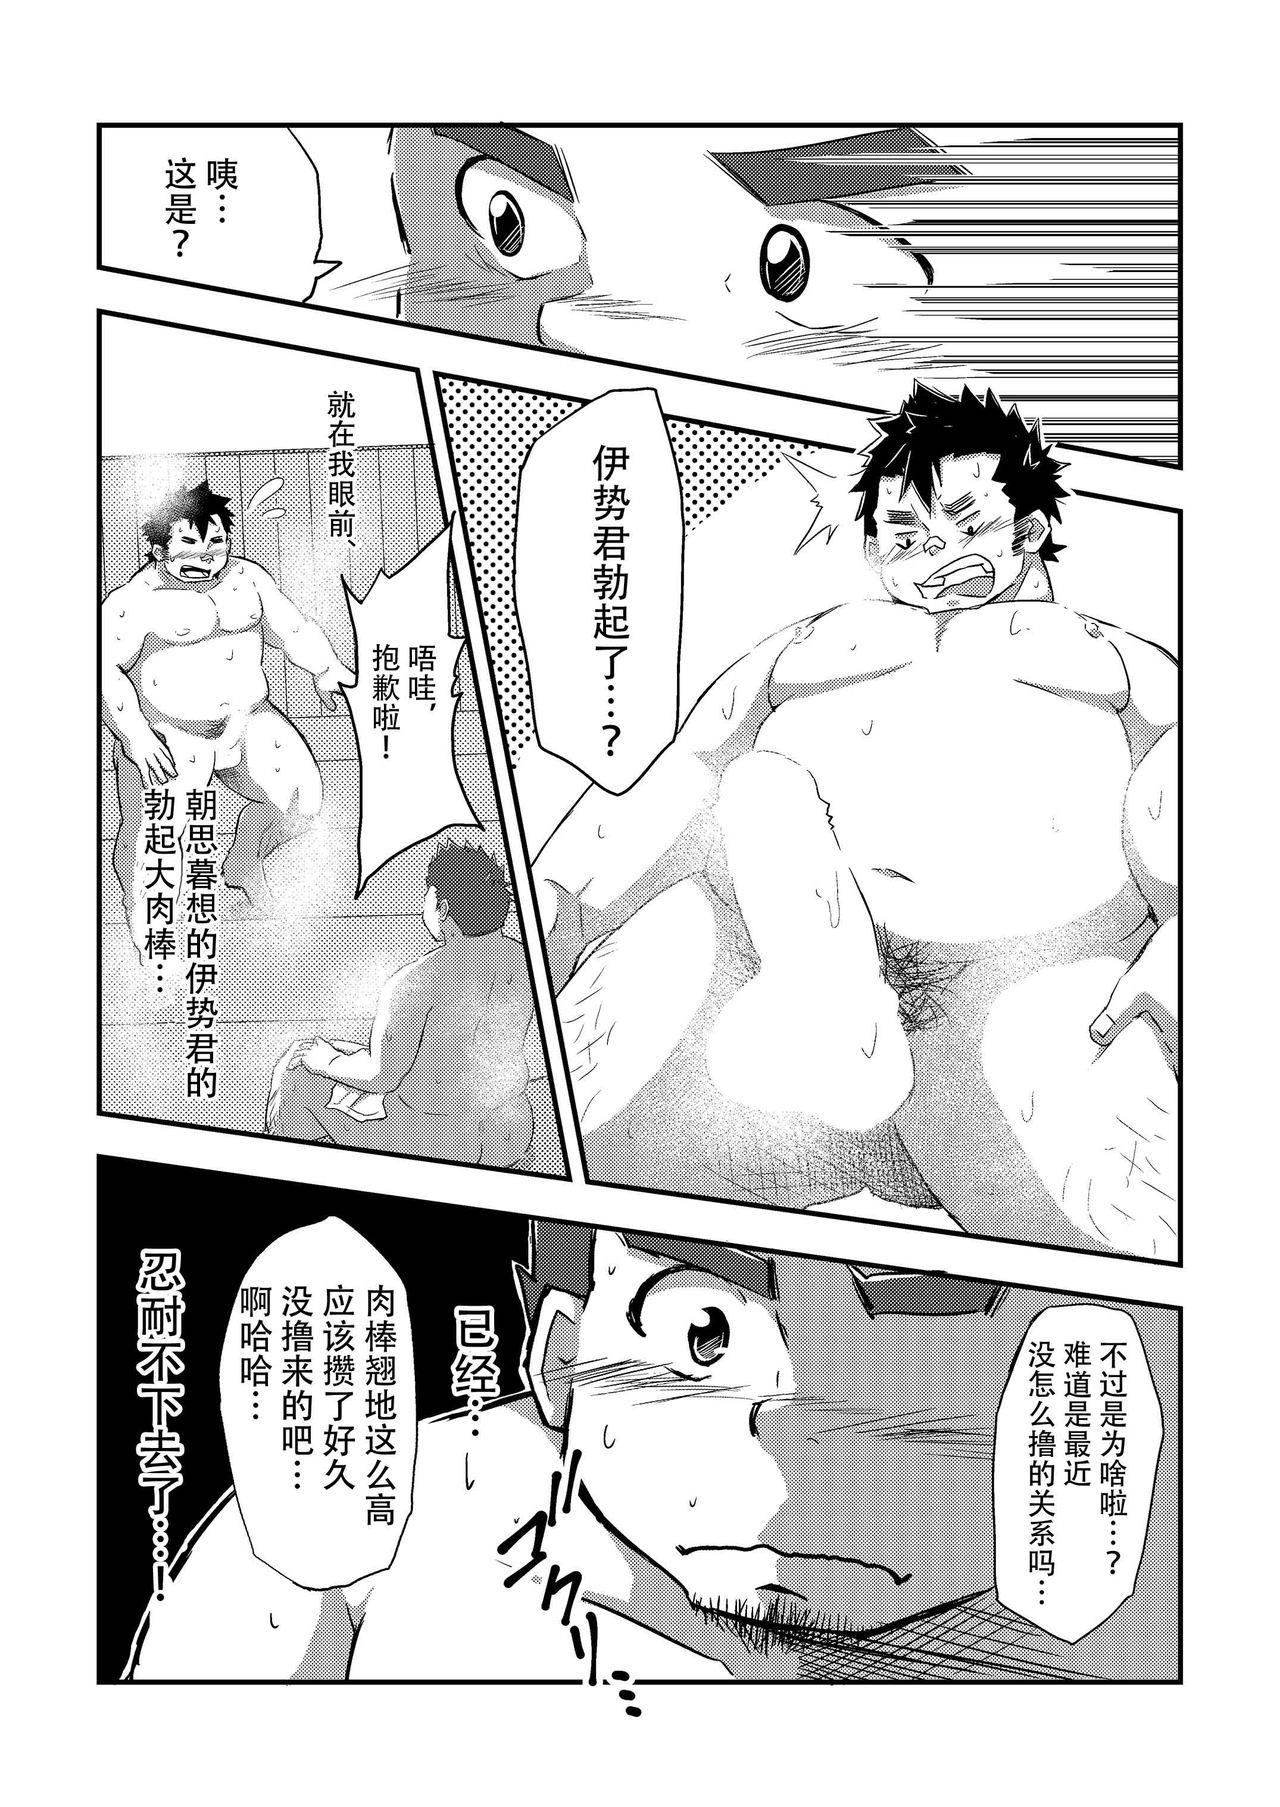 [CorkBOX (ngng)] Ise-kun wa Tamatte Iru. - Ise-kun is horny. [Chinese] {日曜日汉化} [Digital] 11